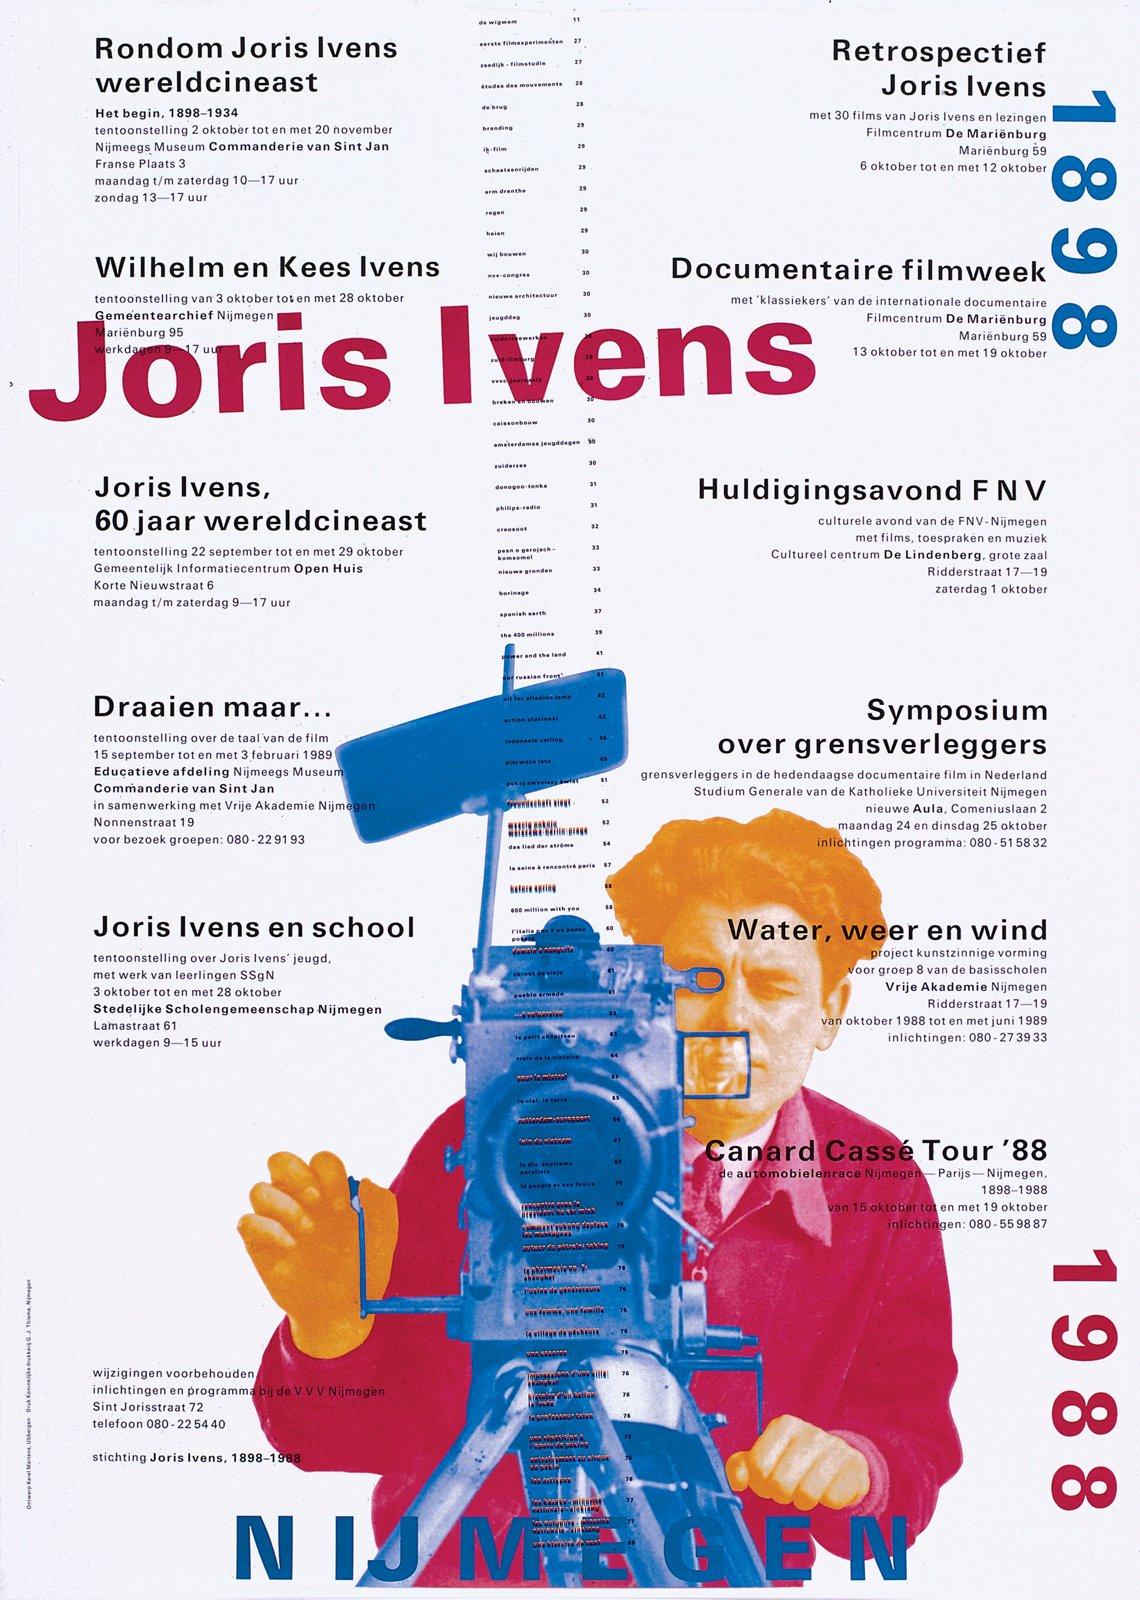 A poster for a film series celebrating Dutch documentary filmmaker Joris Ivens. Dutch Master - Photo 3 of 18